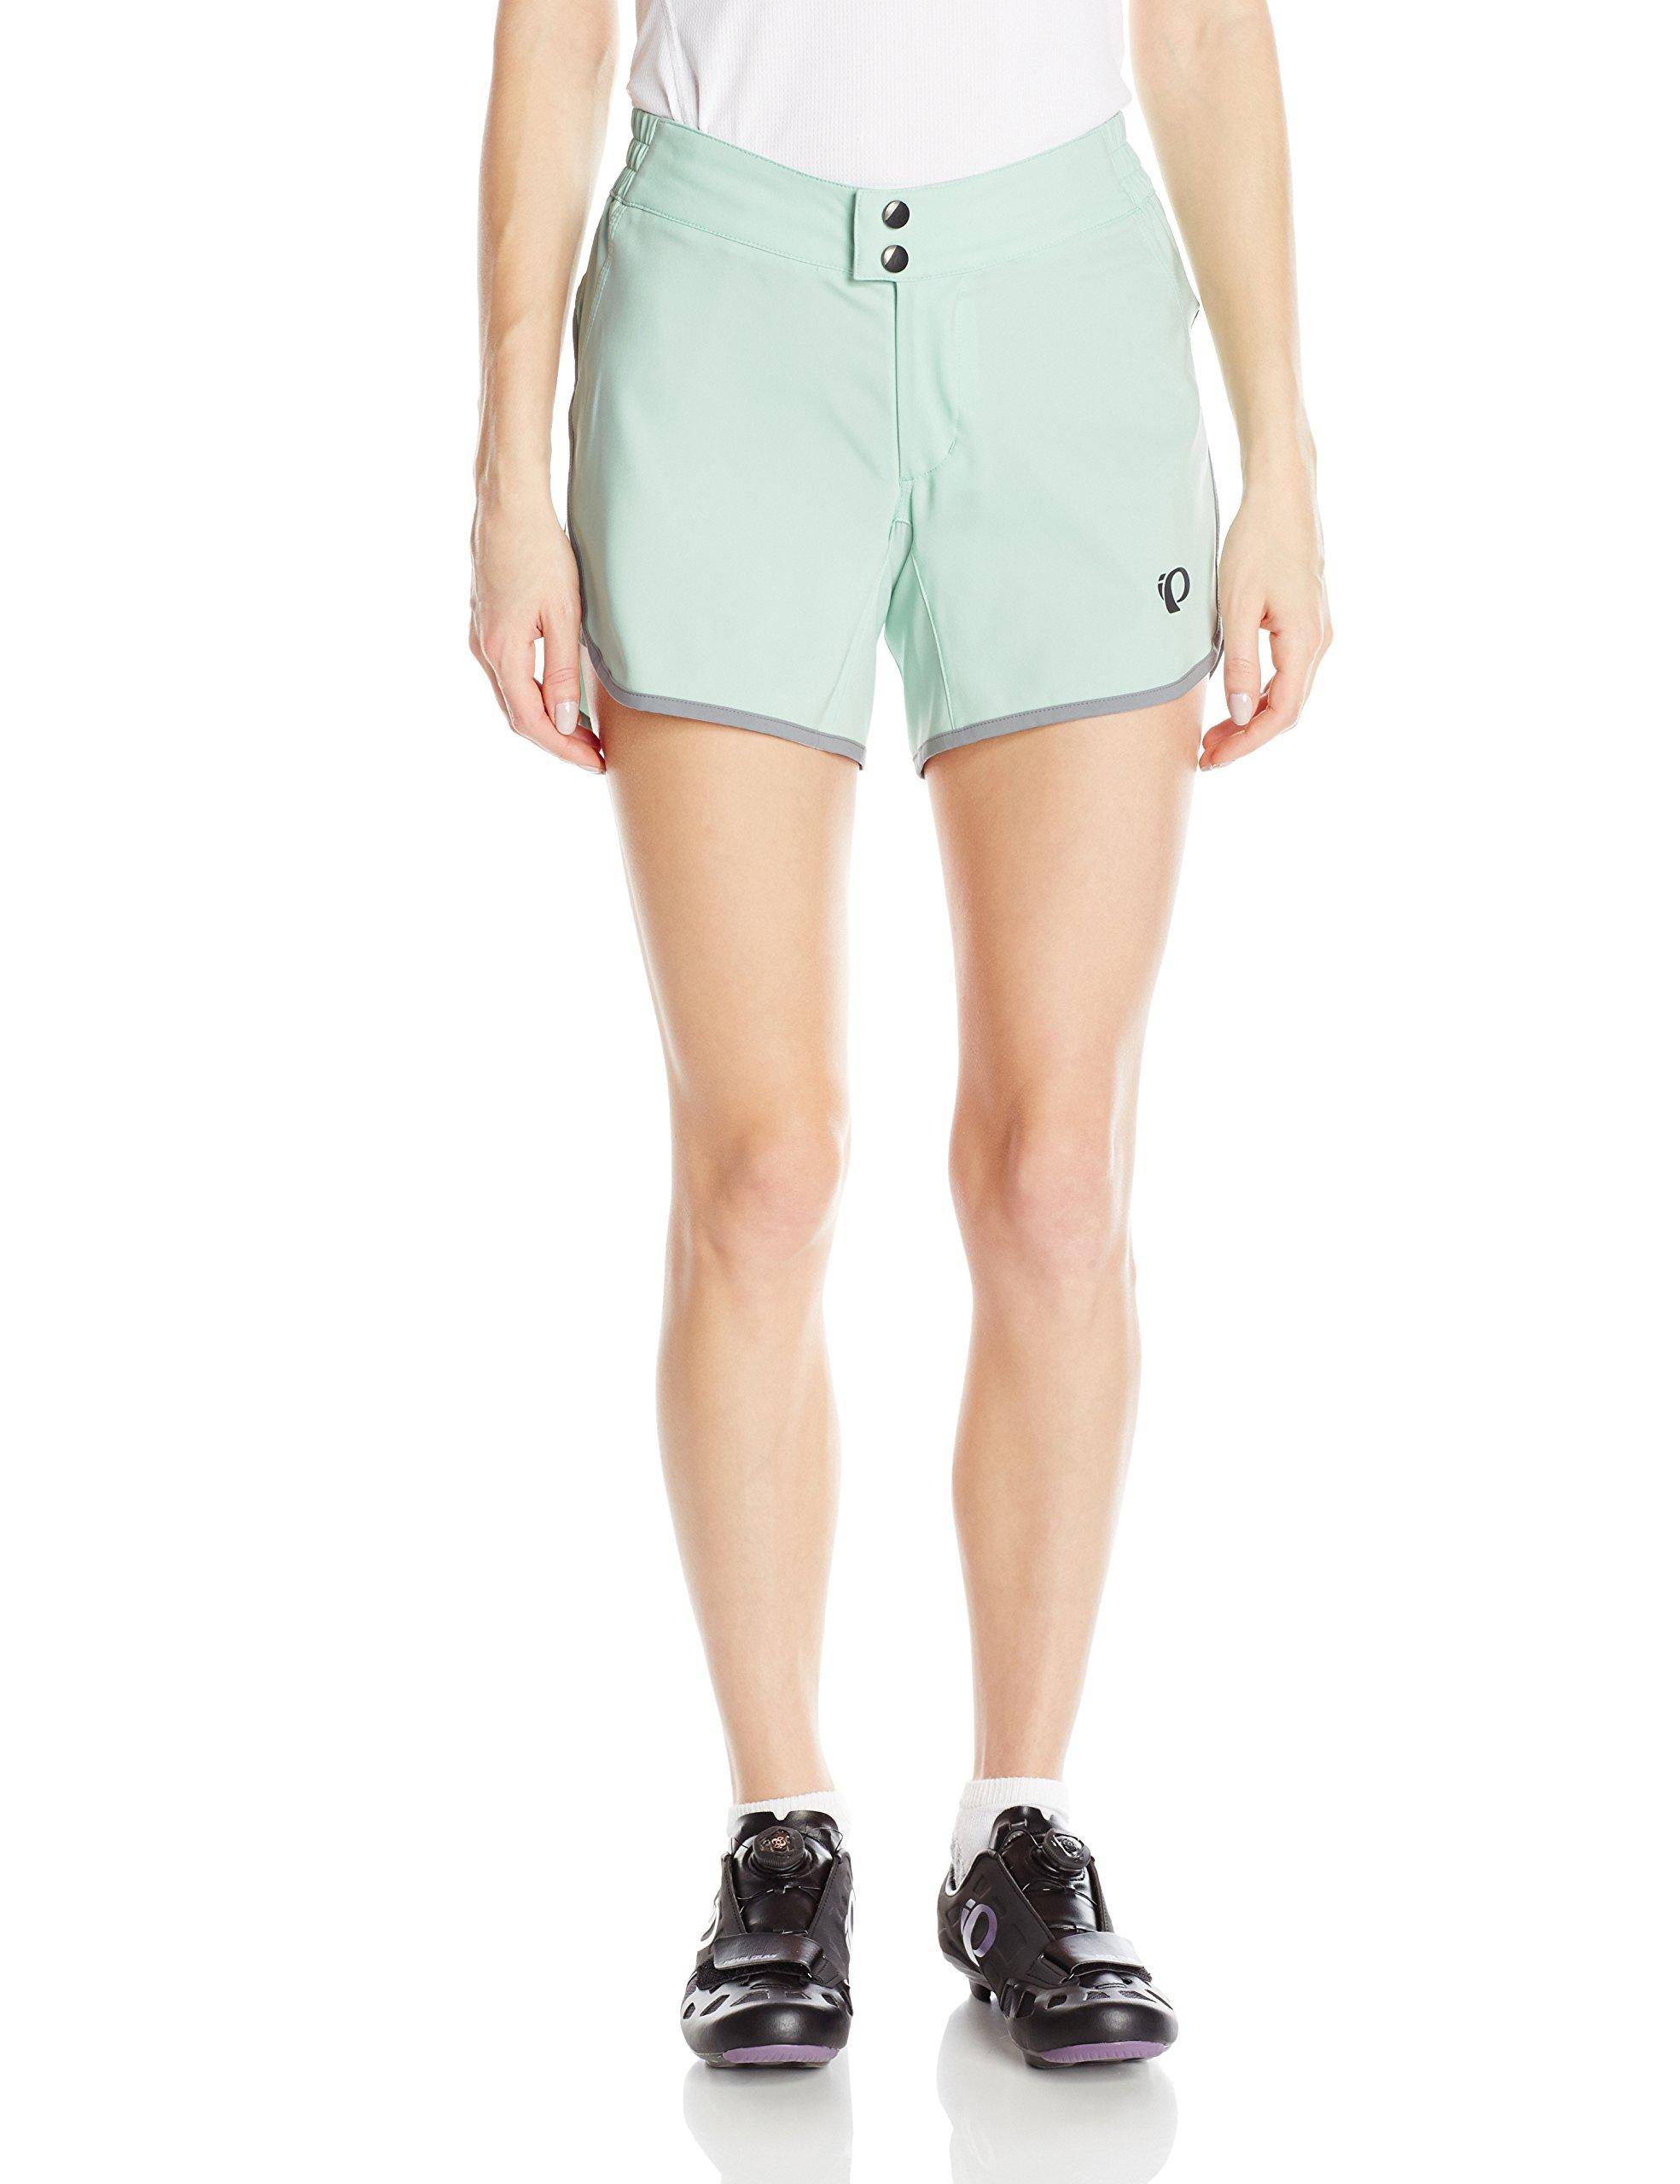 Pearl iZUMi Women's Journey Shorts, Mist Green, Small